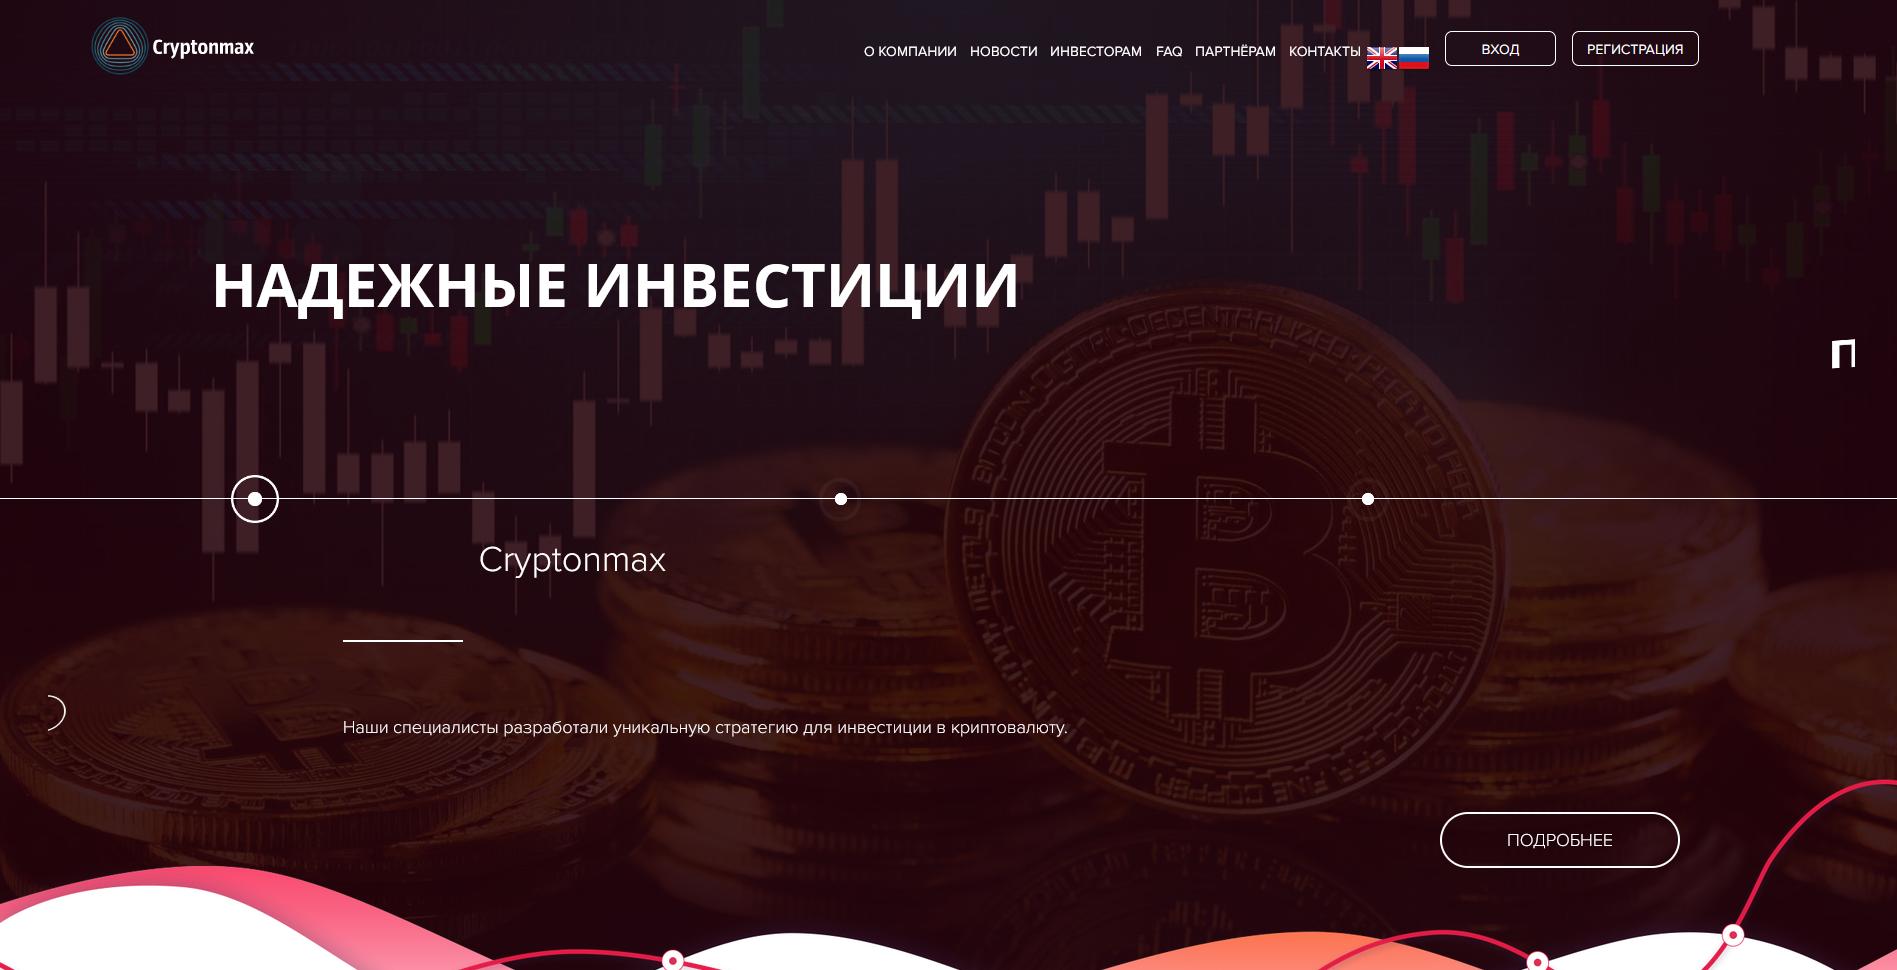 CryptonMax - cryptonmax.com